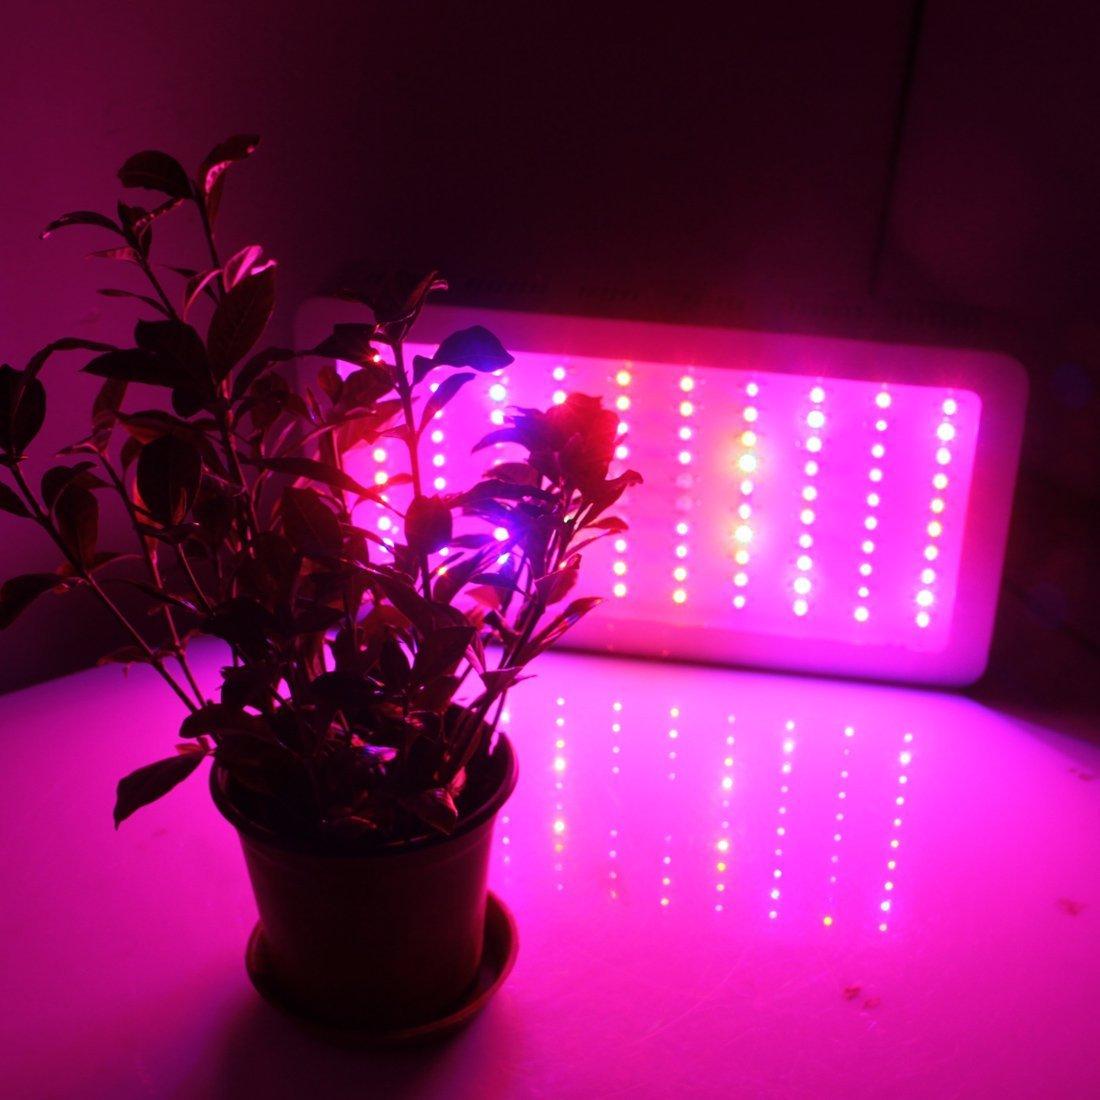 Amazon hhe 300w led grow light full spectrum for indoor plant amazon hhe 300w led grow light full spectrum for indoor plant growingsilver home kitchen parisarafo Choice Image